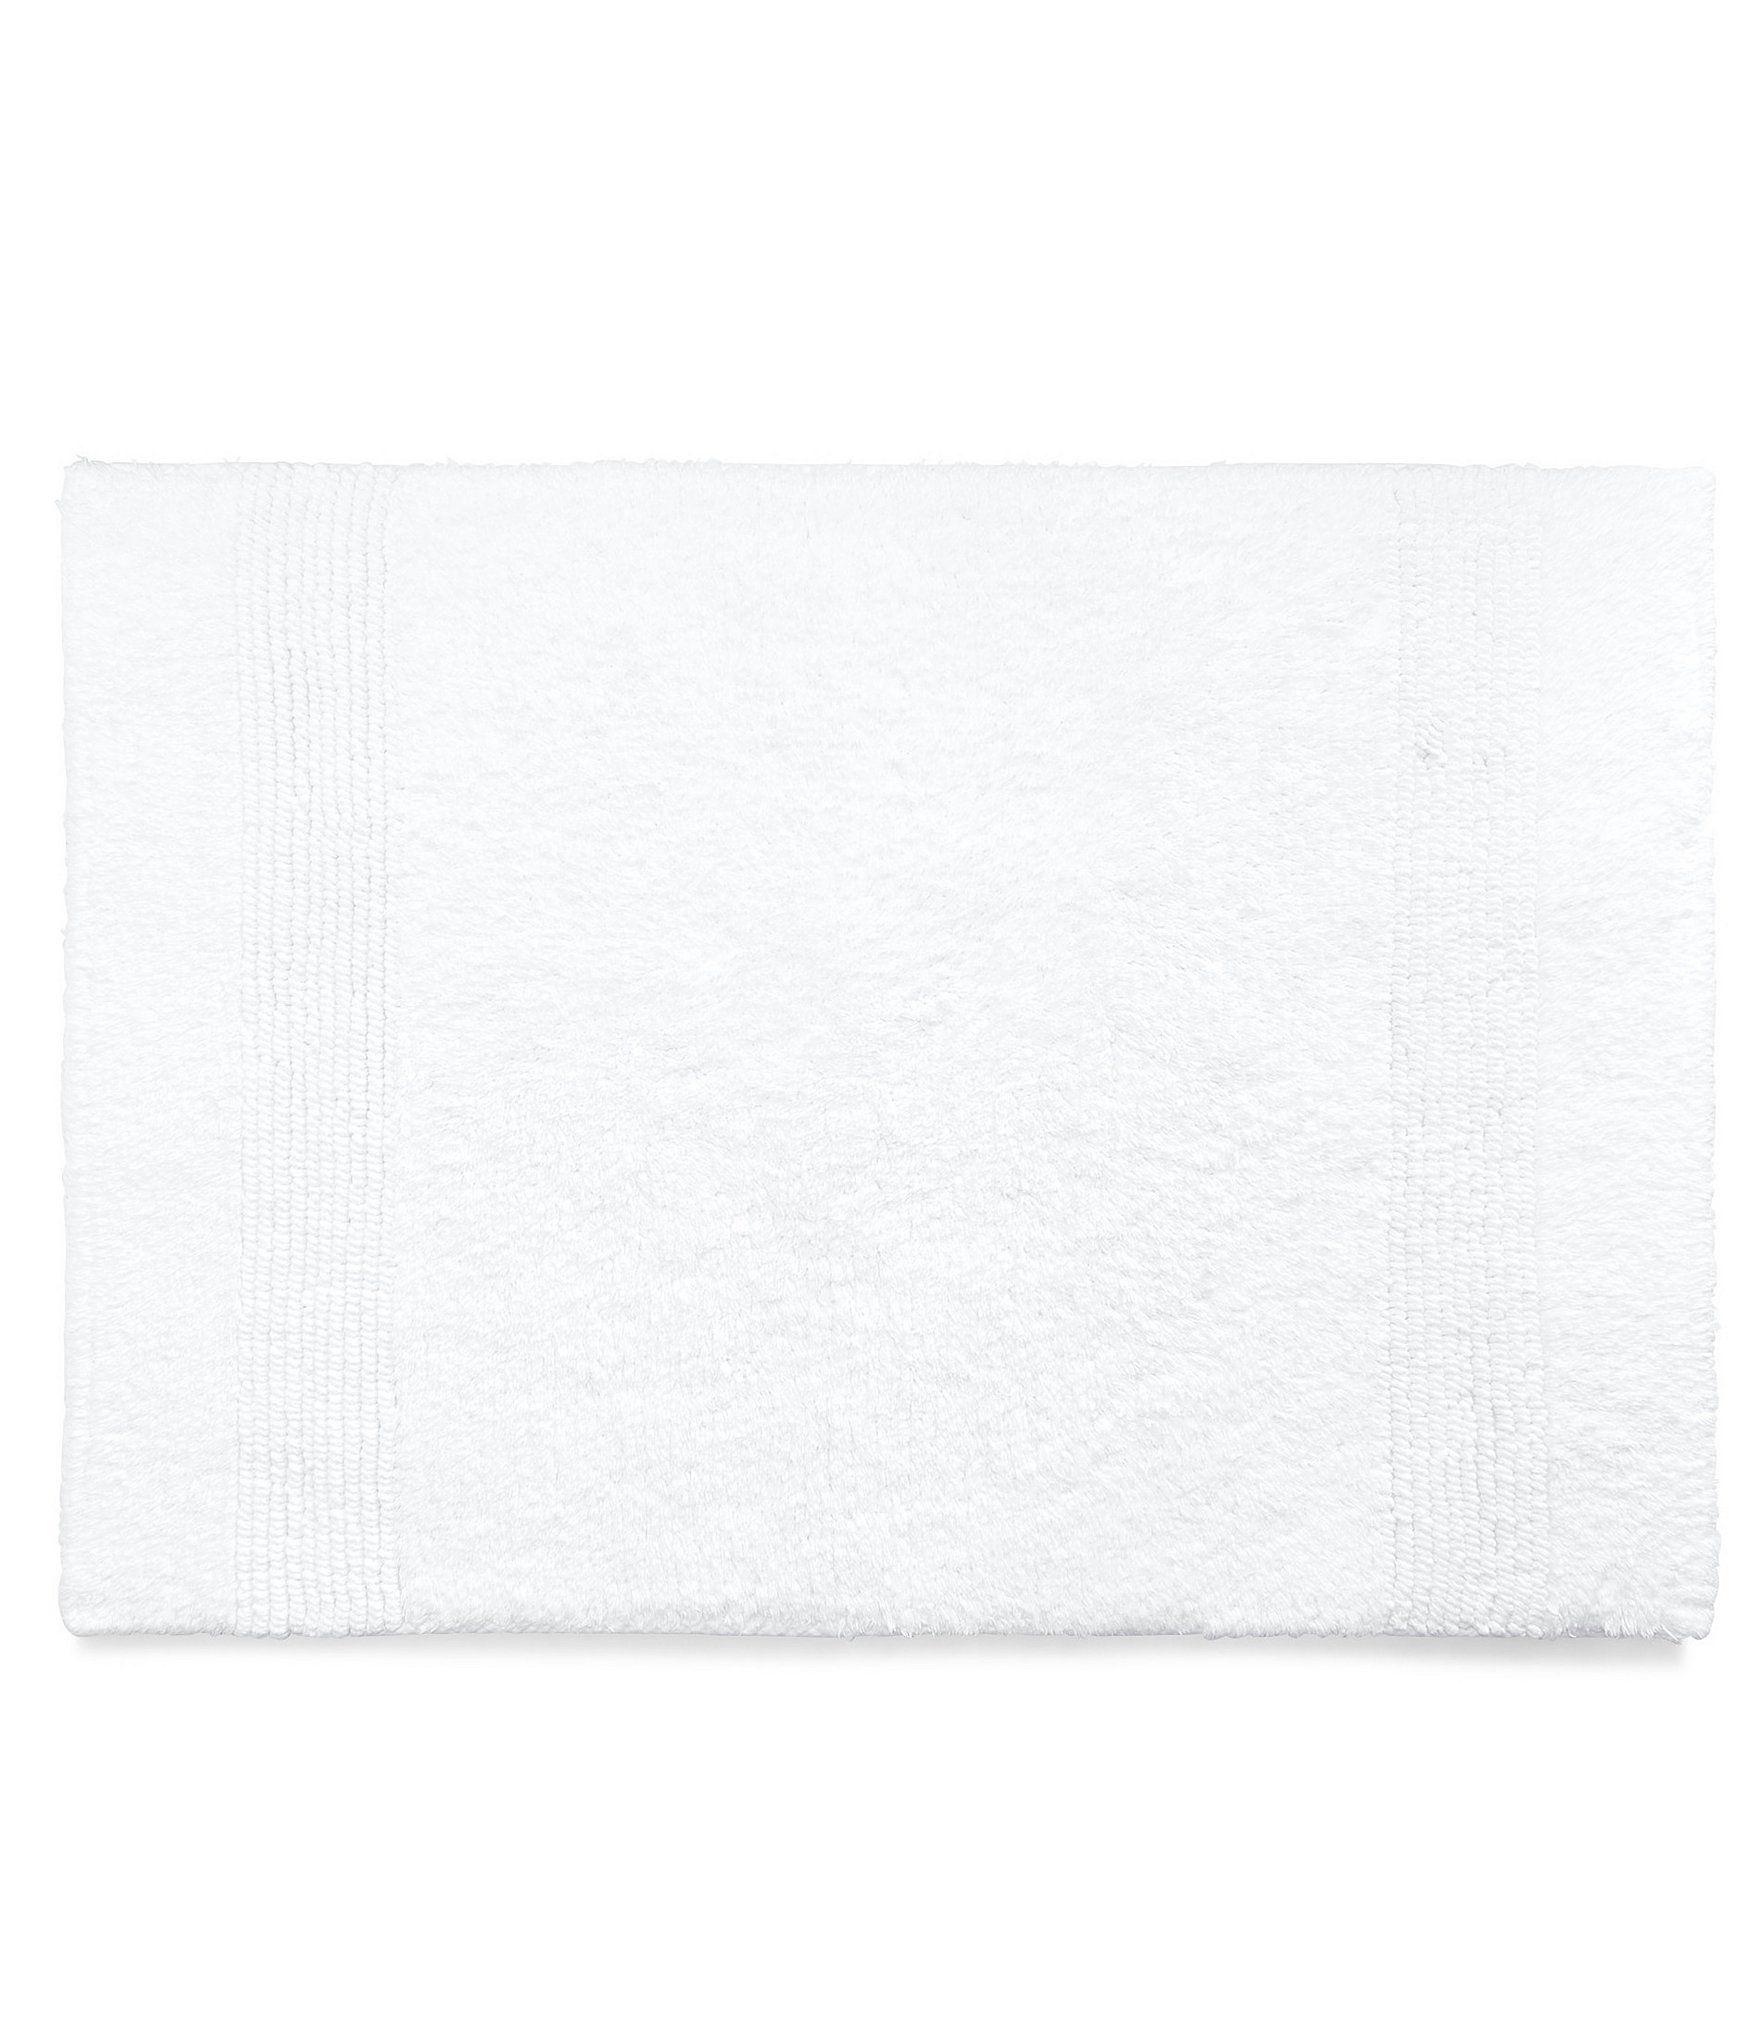 Lauren Ralph Lauren Sanders Bath Rug Dillard S Bath Rug Rugs Rugs On Carpet [ 2040 x 1760 Pixel ]